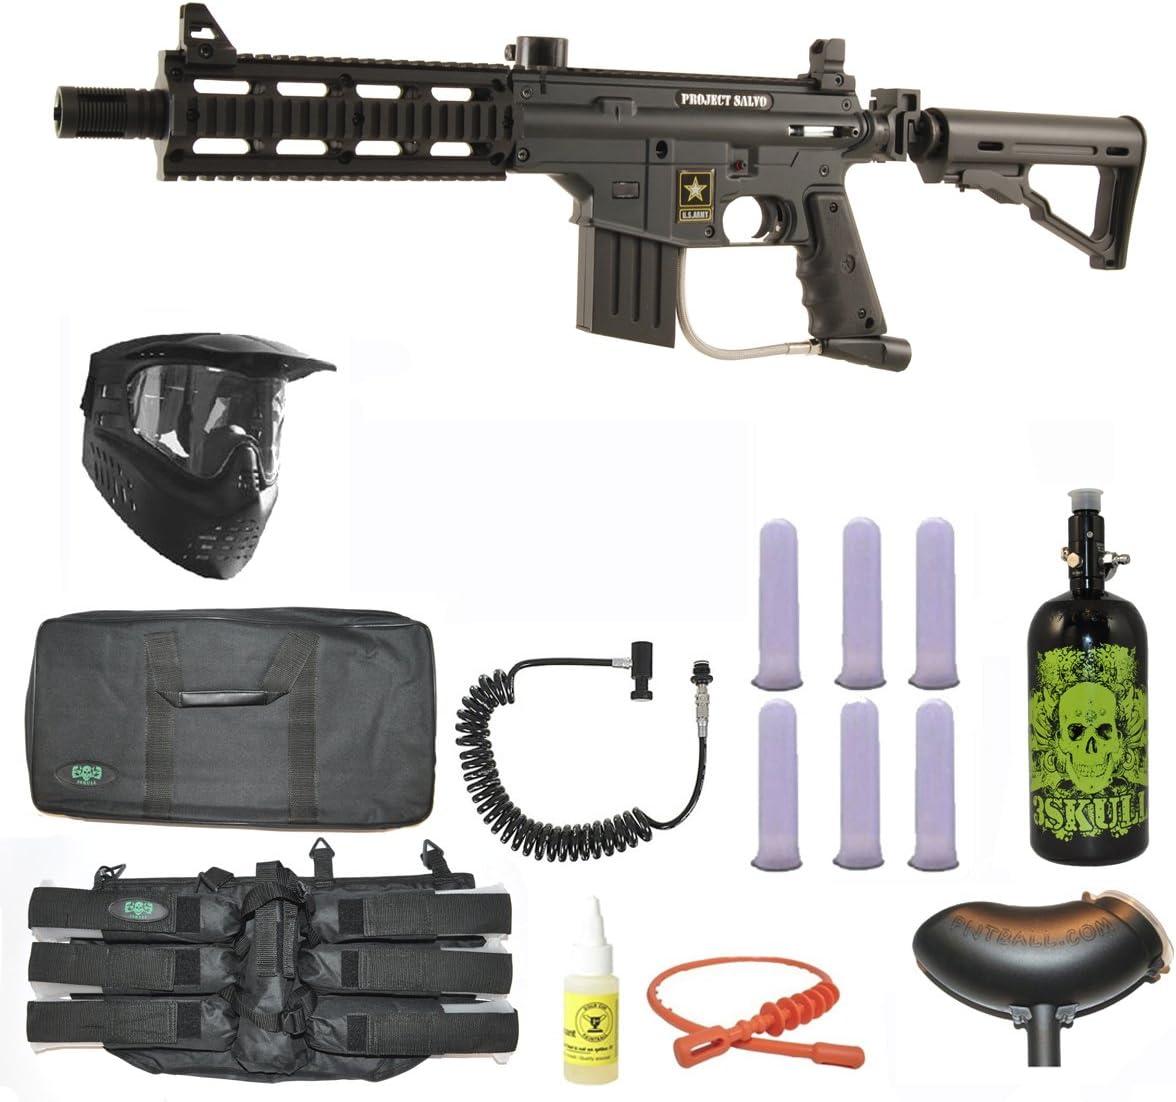 3Skull Paintball Tippmann 98 Custom Adjustable Marker Gun Tactical Stock Black